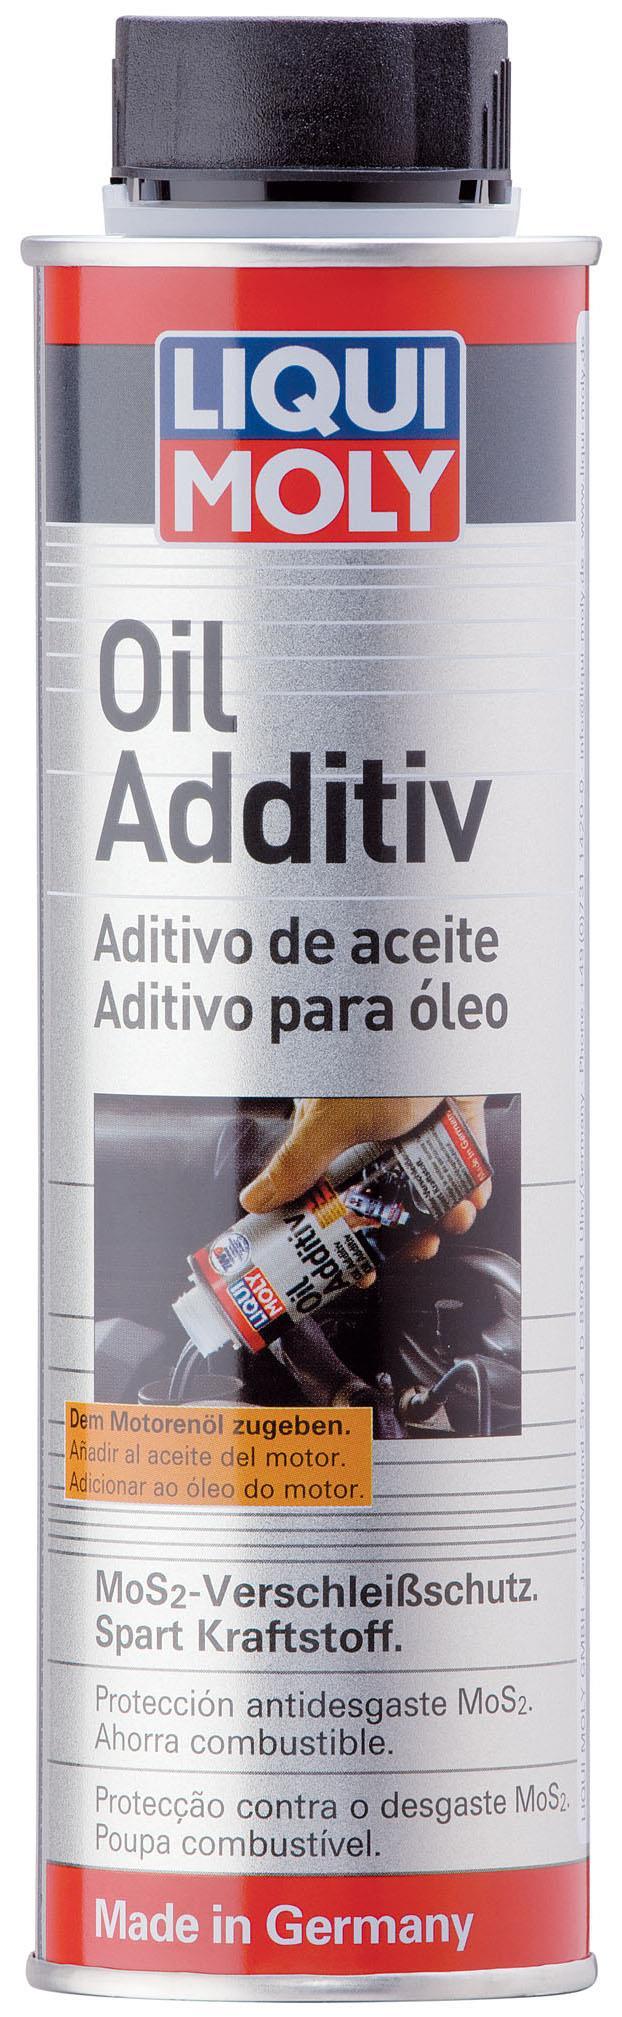 liqui moly oil additiv mos2 300ml ca end 5 20 2019 7 15 pm. Black Bedroom Furniture Sets. Home Design Ideas